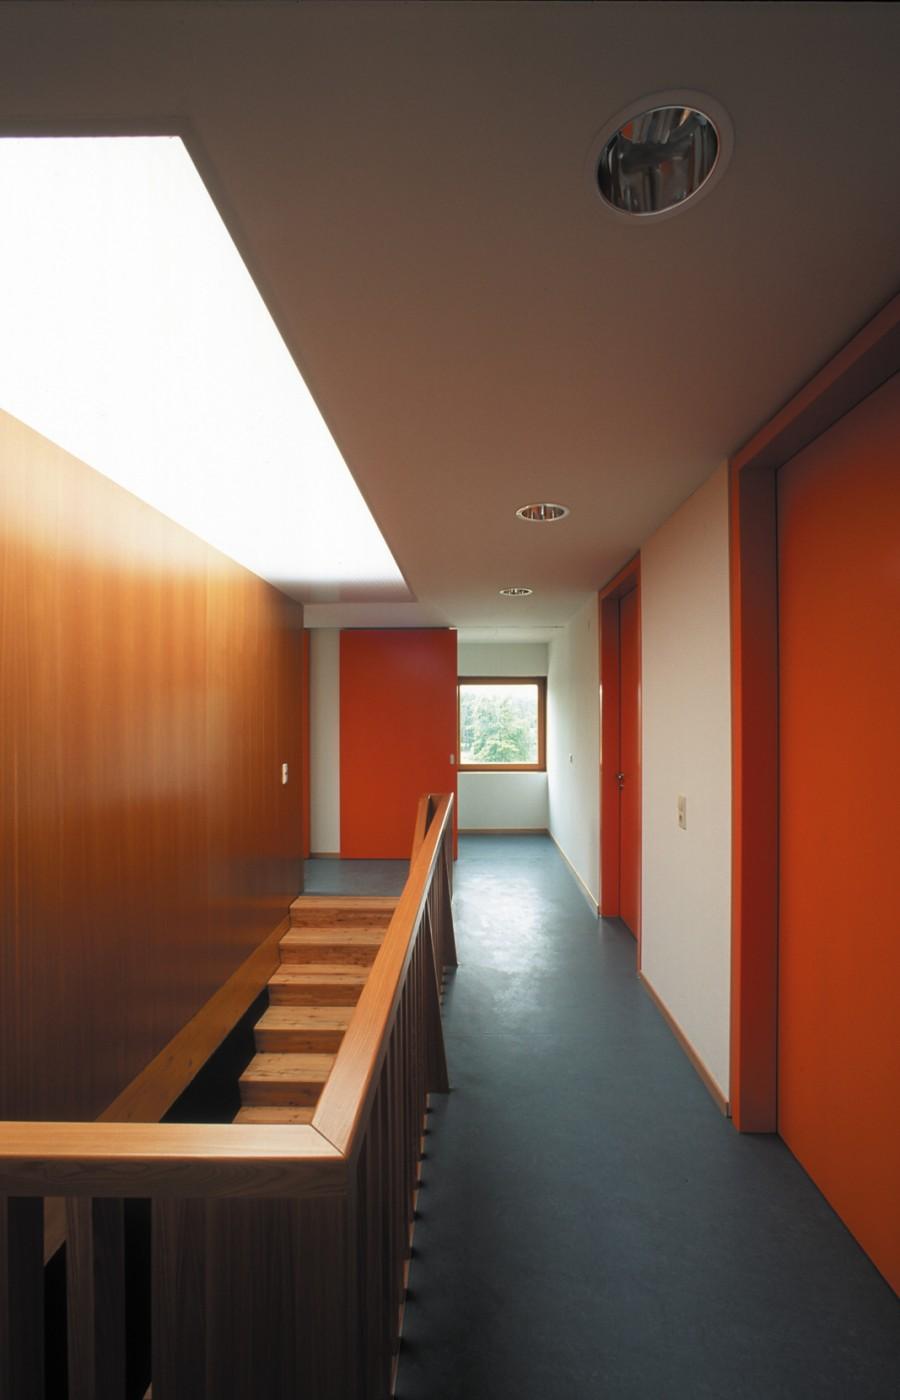 bauhof bfa b ro f r architektur. Black Bedroom Furniture Sets. Home Design Ideas